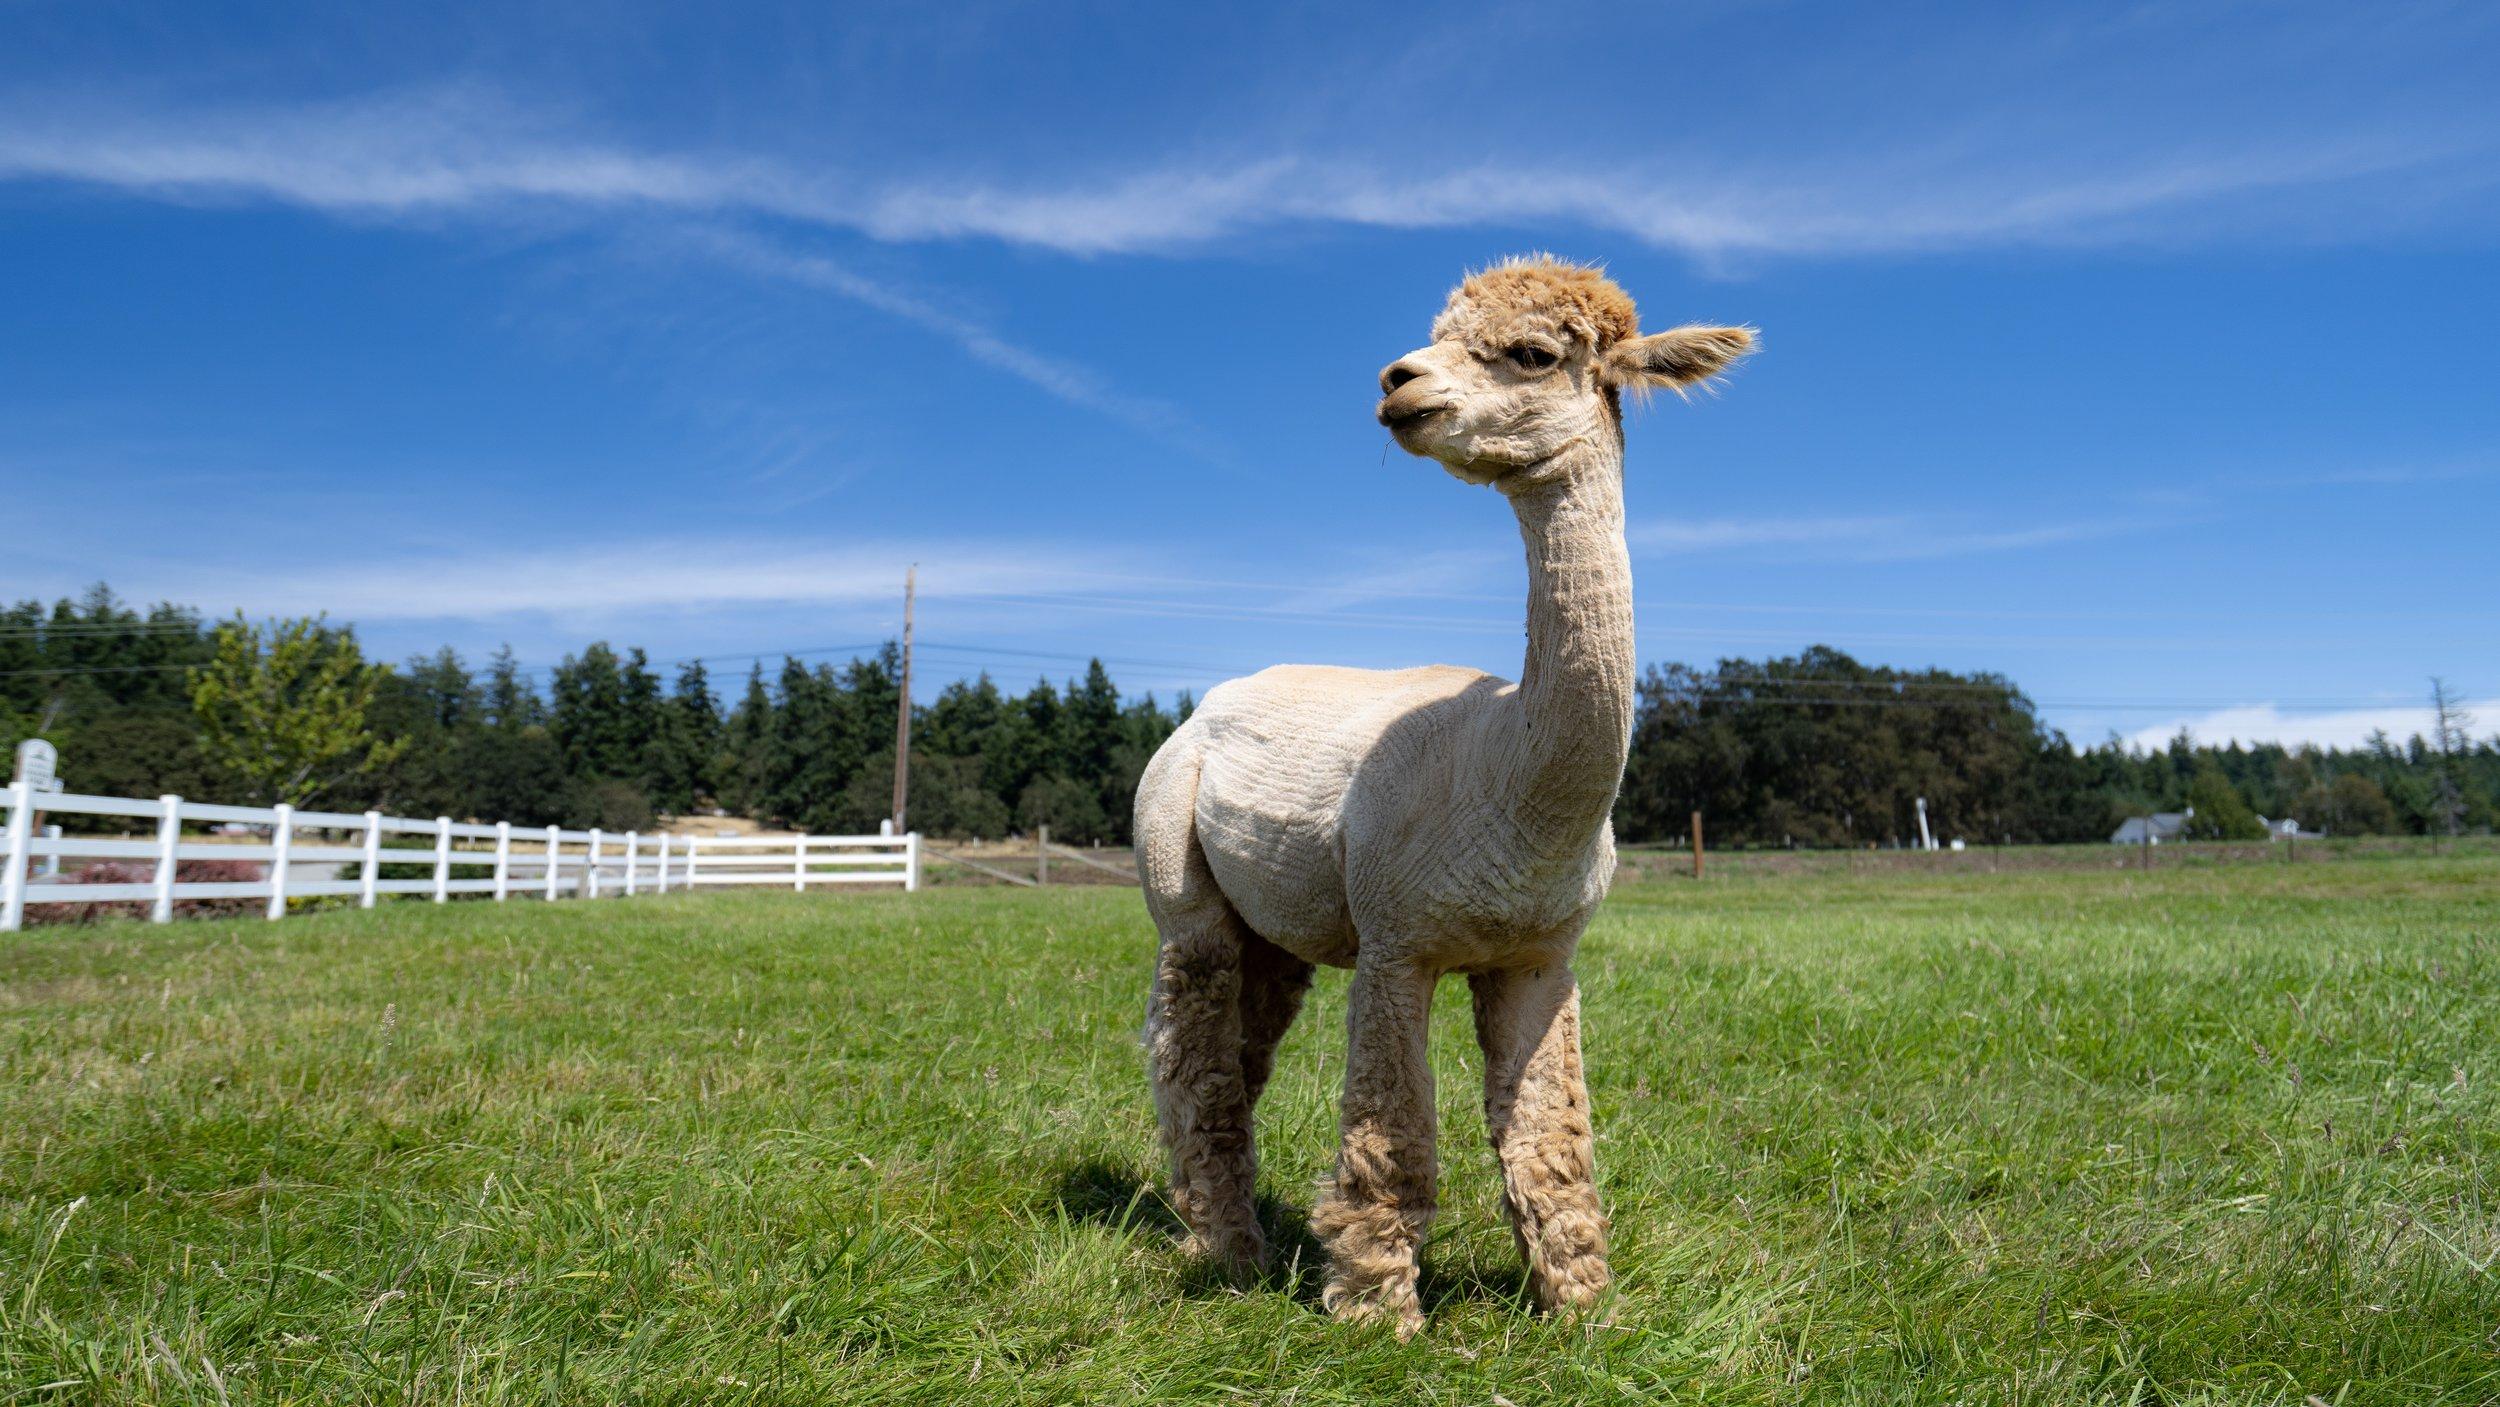 krystal_acres_alpaca_farm.jpg